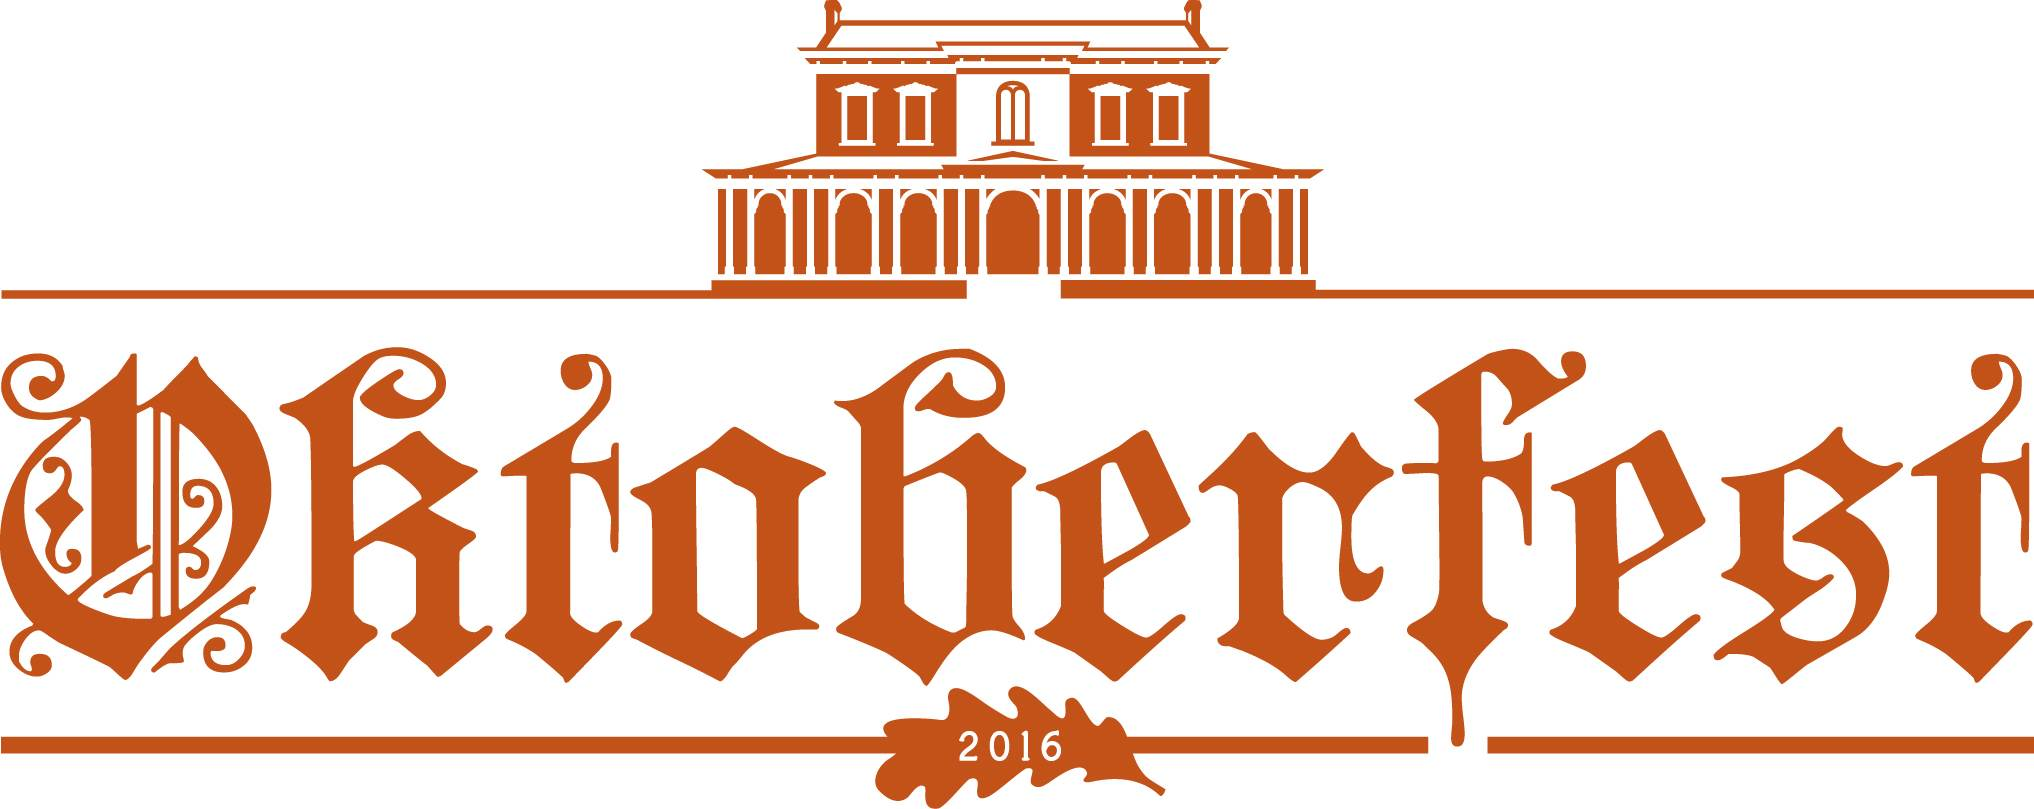 <br>Oktoberfest<br>September 24th from 5:00-9:00pm